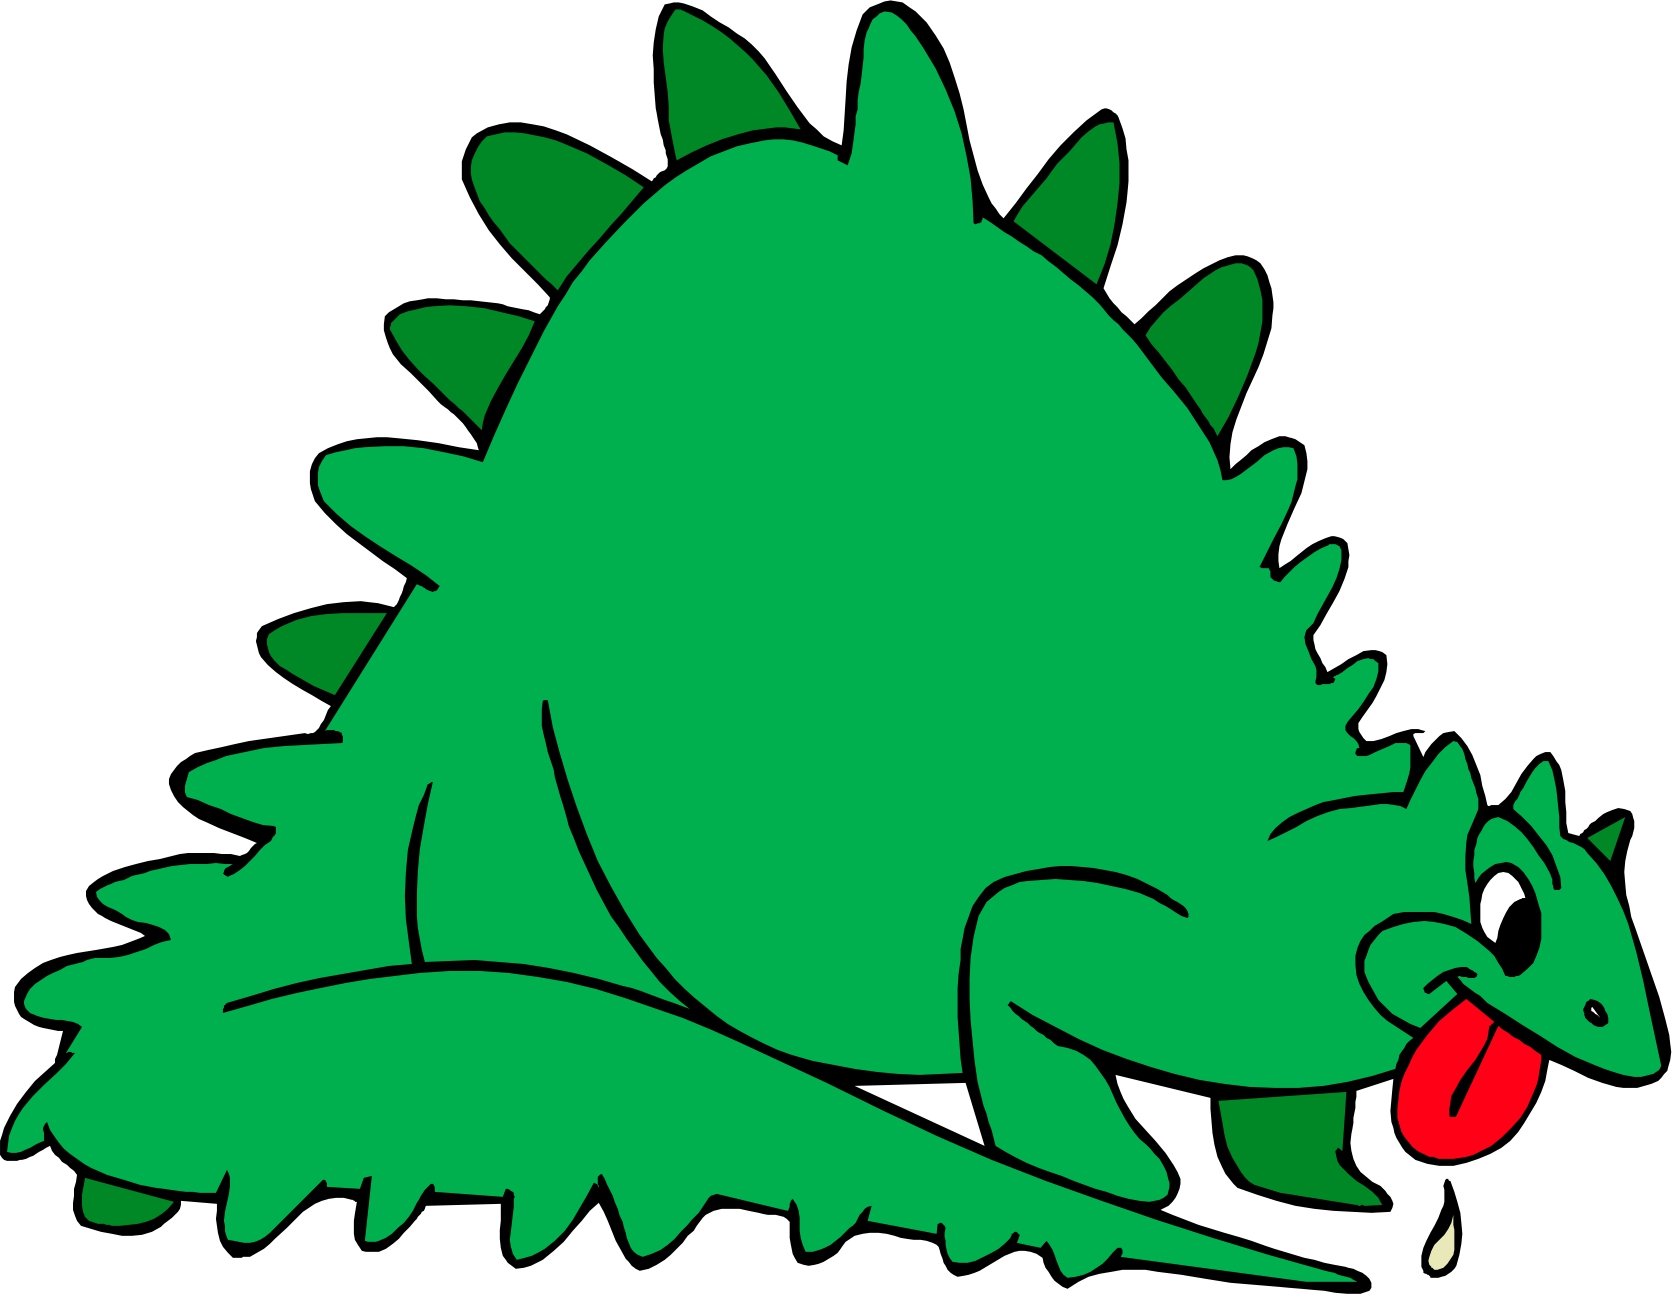 Cartoon Dinosaur Clipart - Clipart Kid